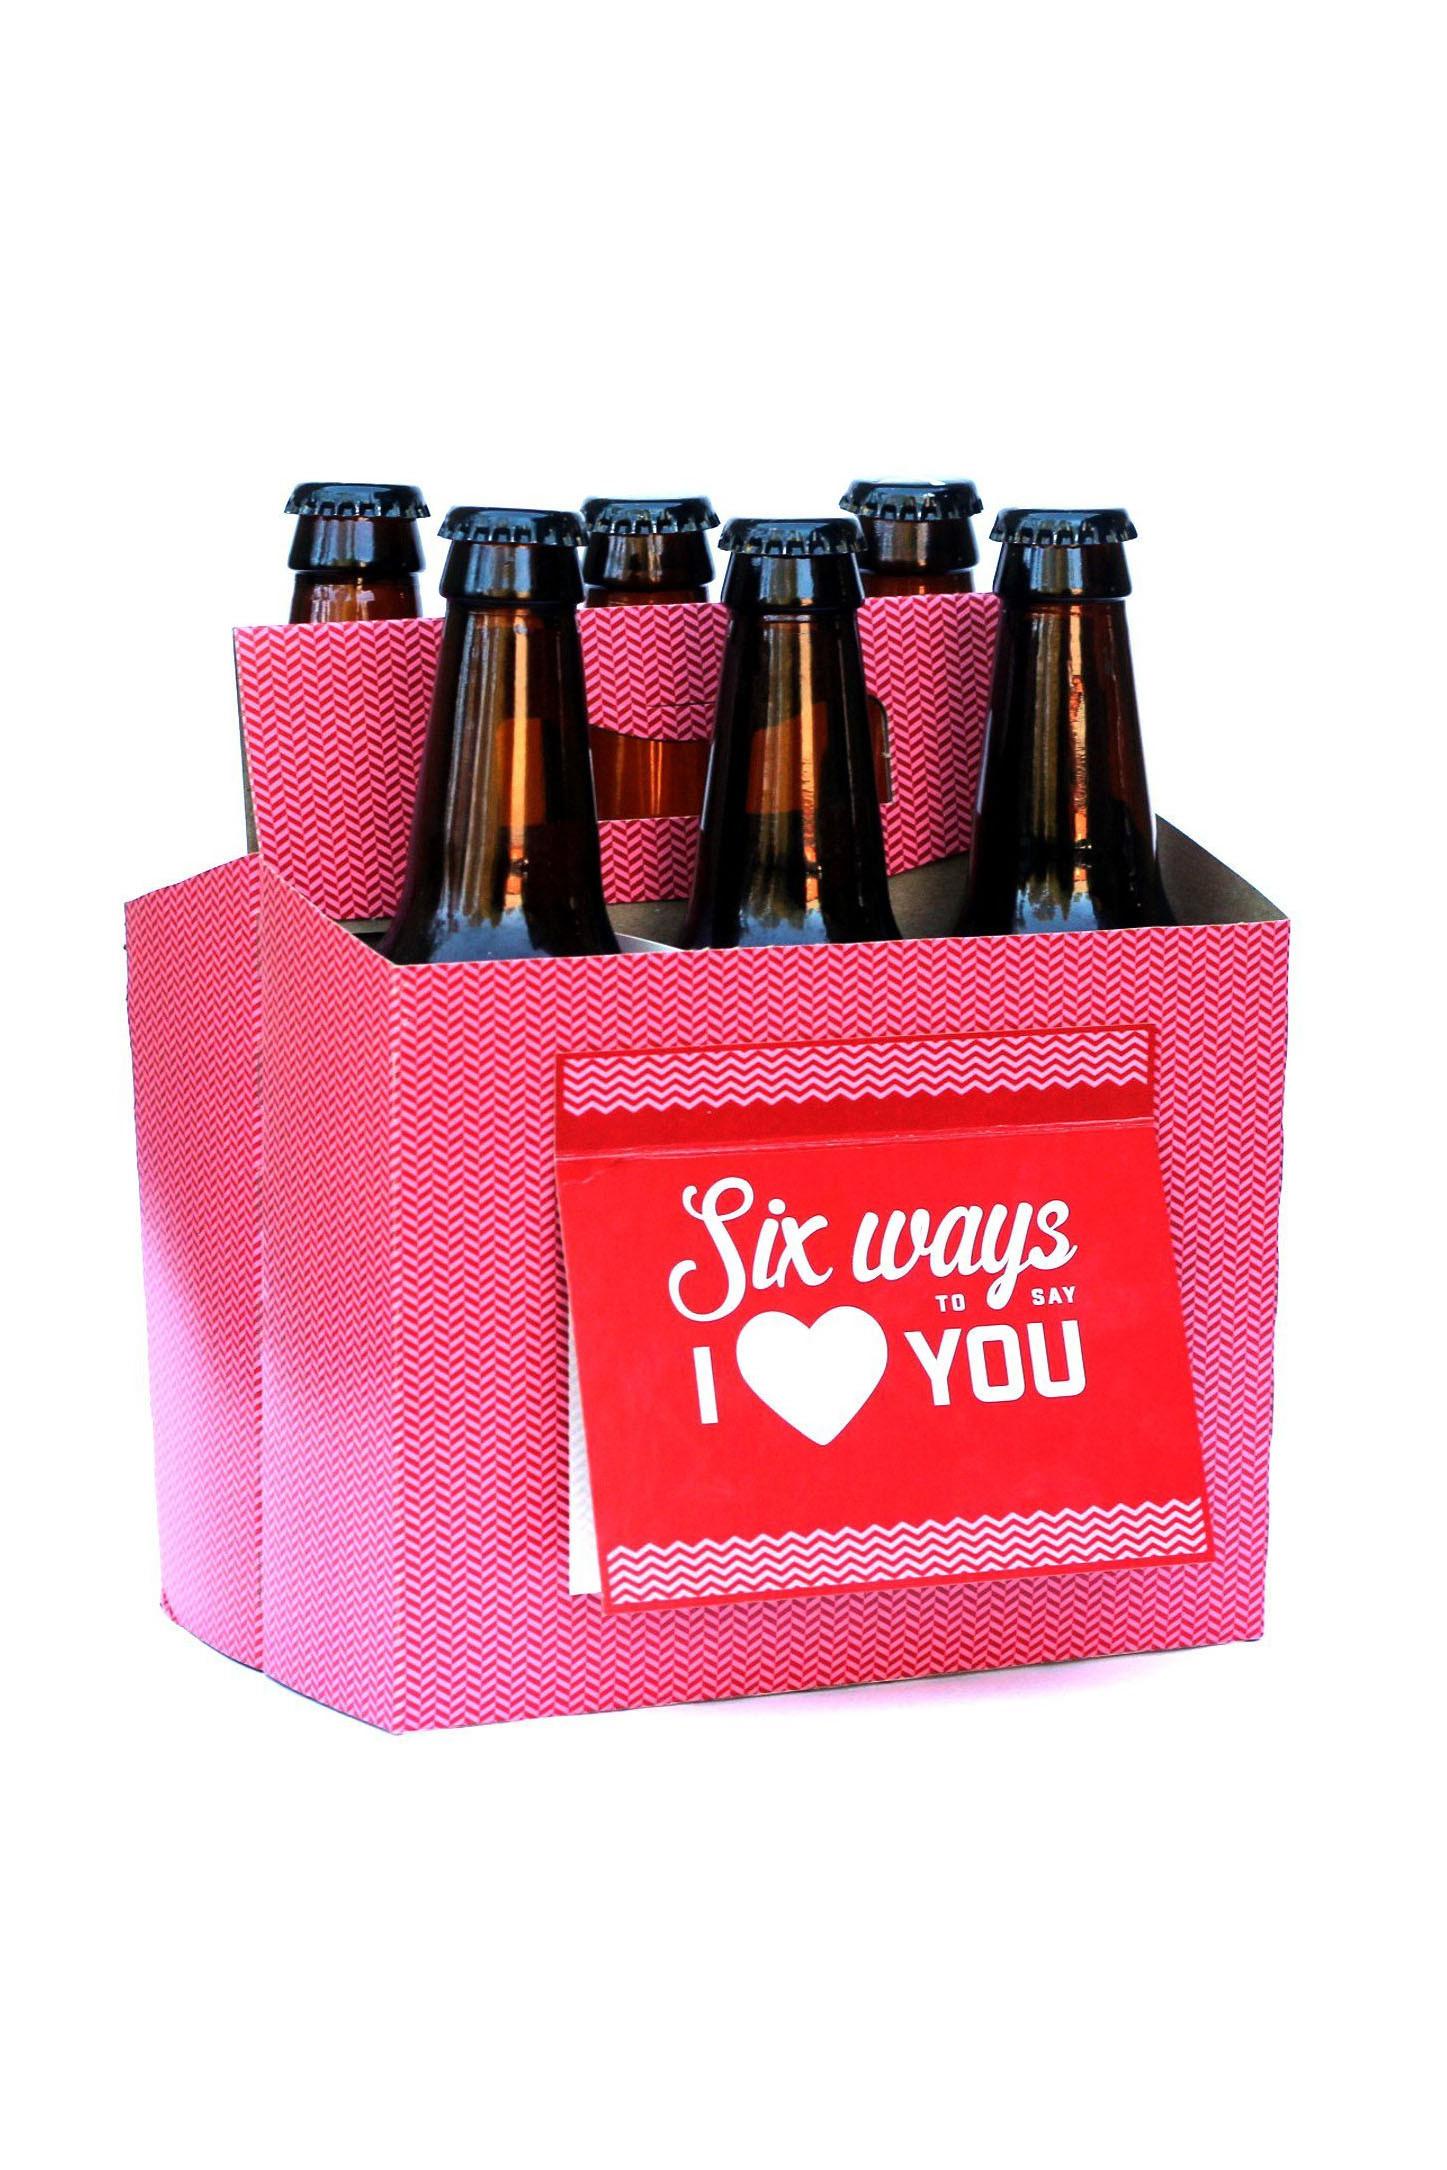 Valentine Gift Ideas For Men  30 Best Valentine s Day Gifts for Him 2017 Good Ideas